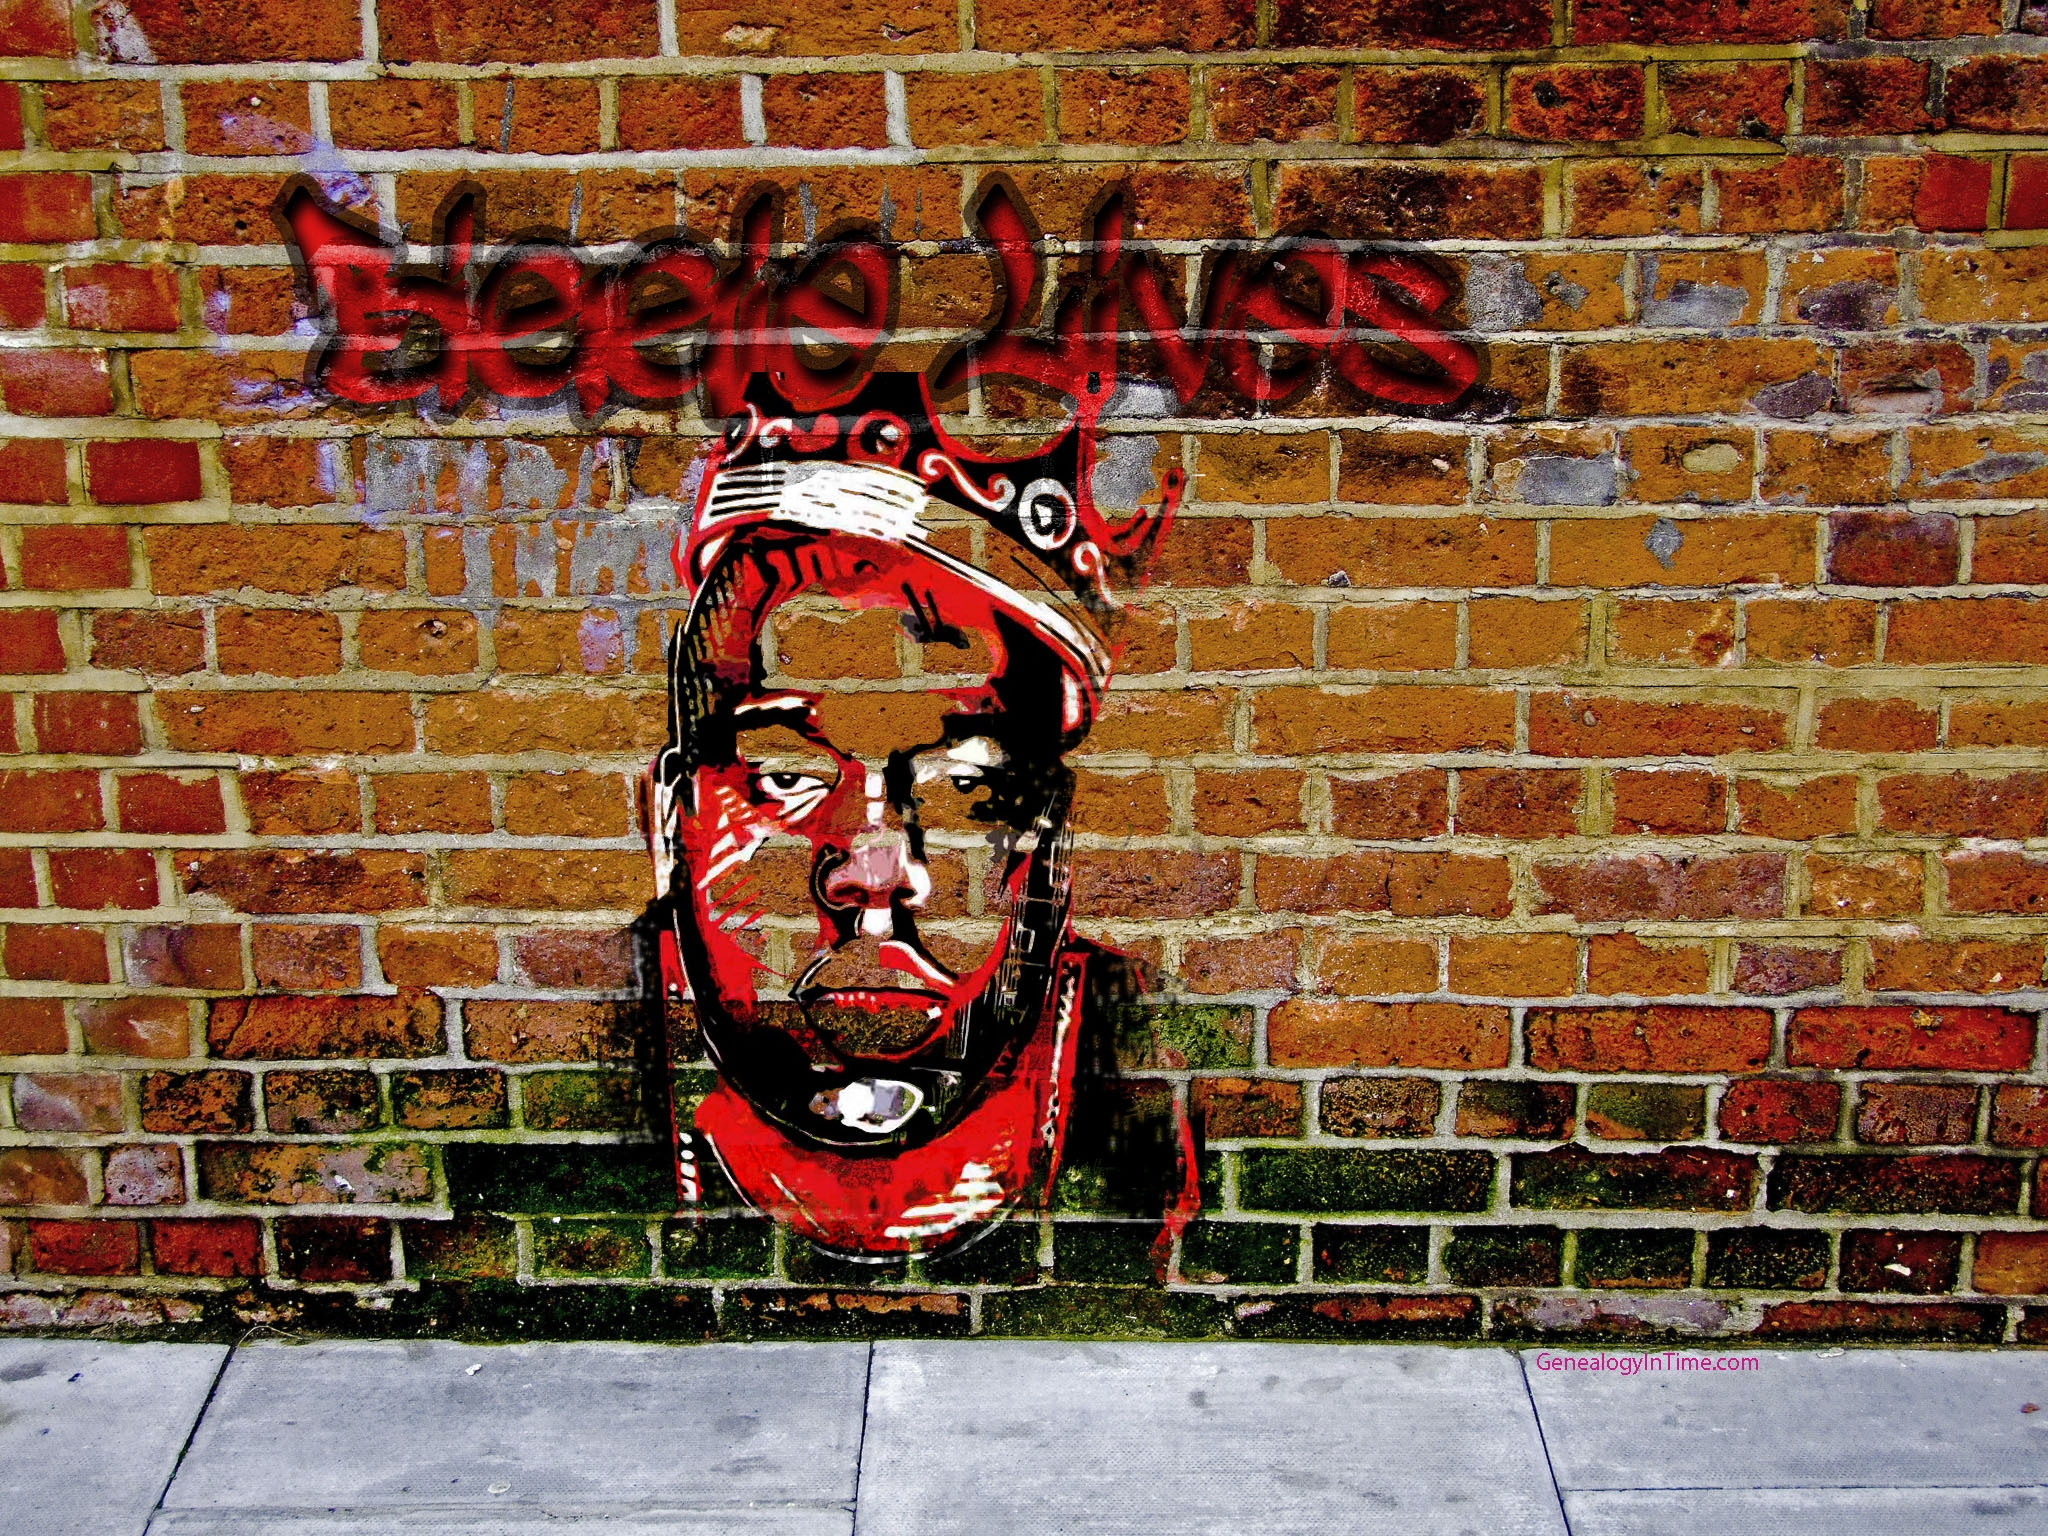 Drawn brick graffito brick wall Graffiti along Design : Brick